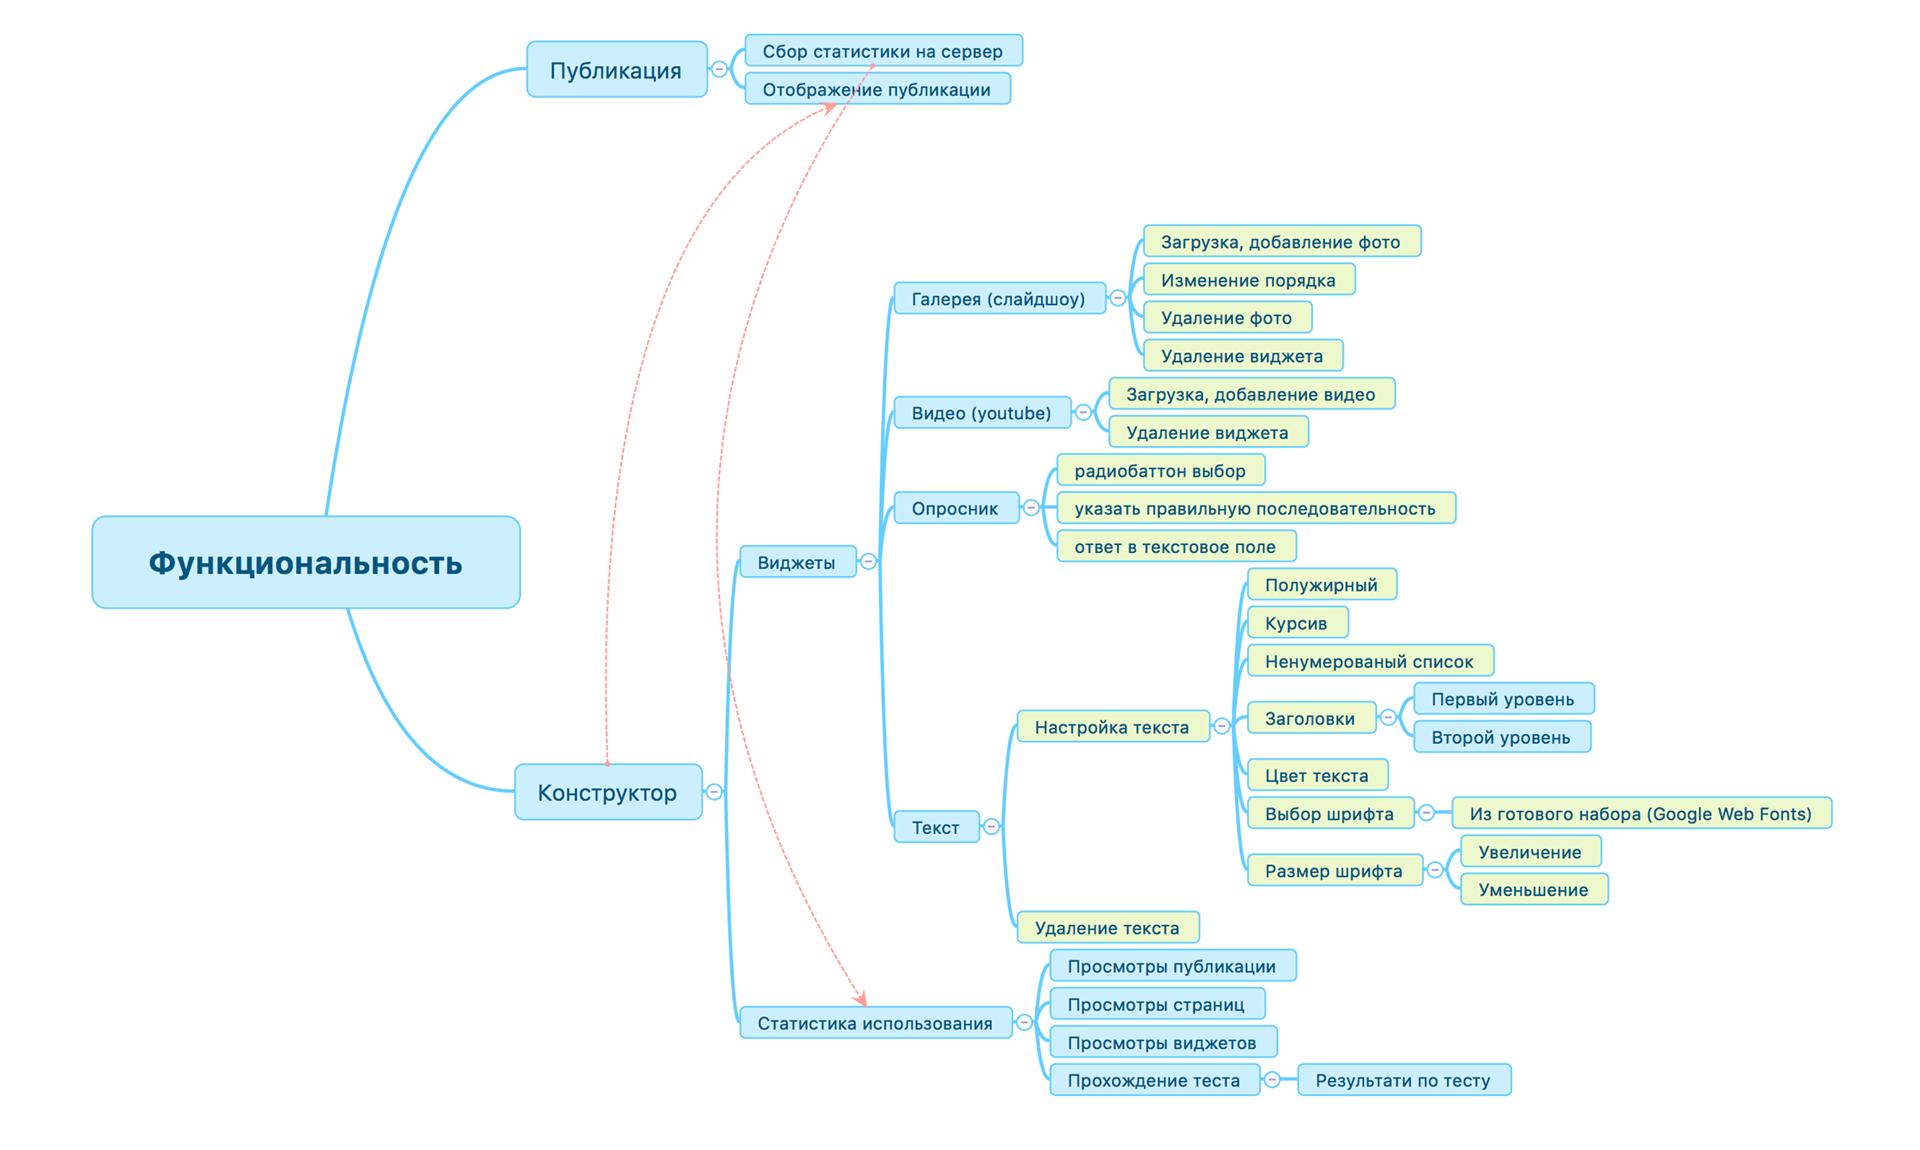 Структура функционала CourseYard